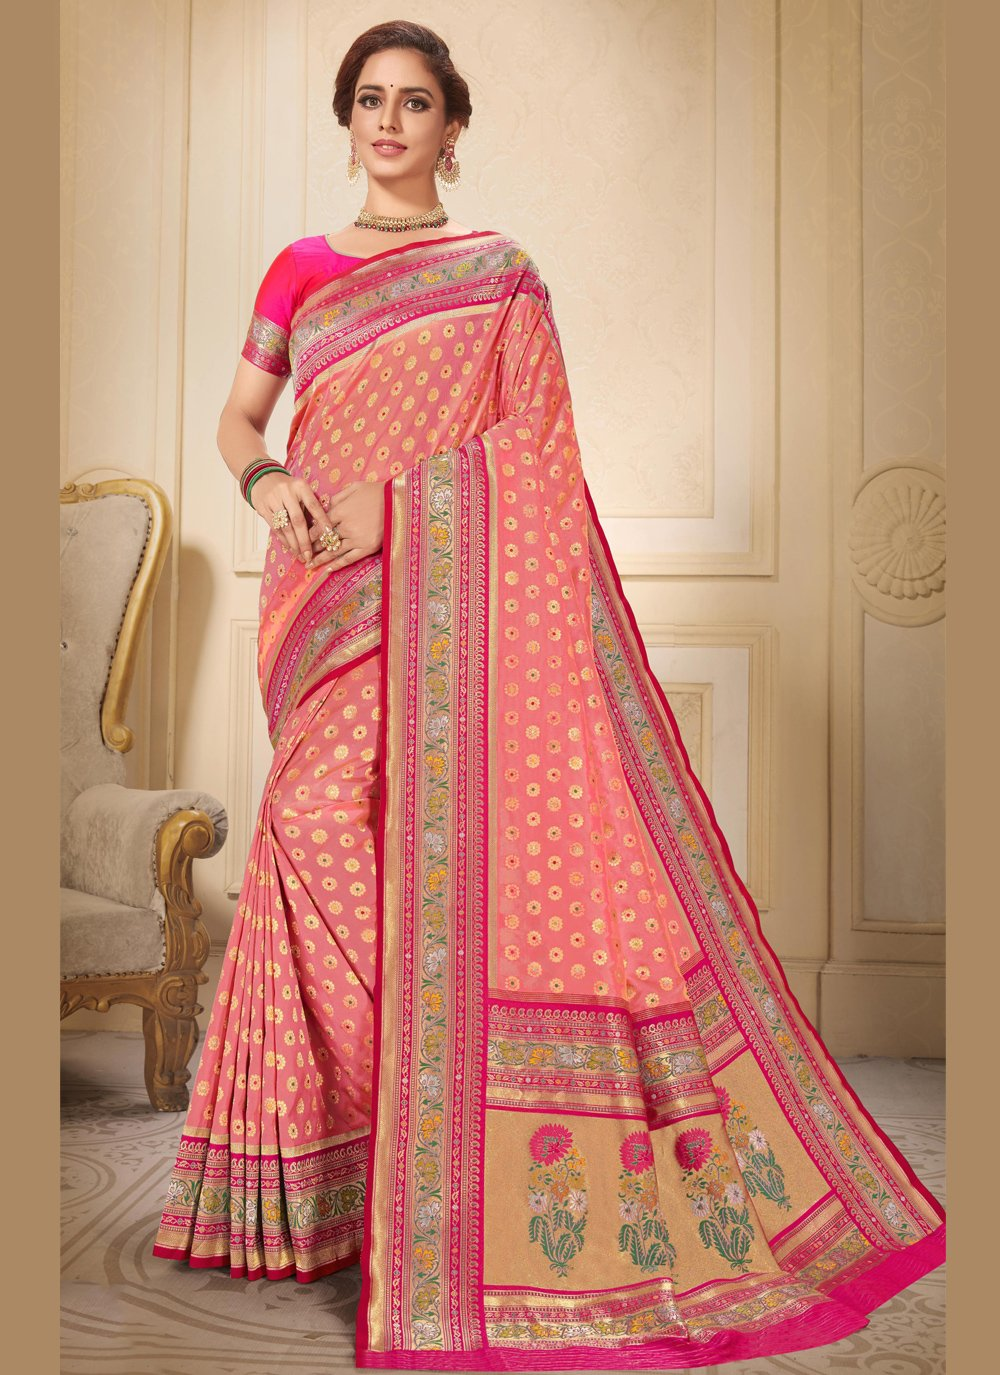 Brocade Wedding Traditional Saree